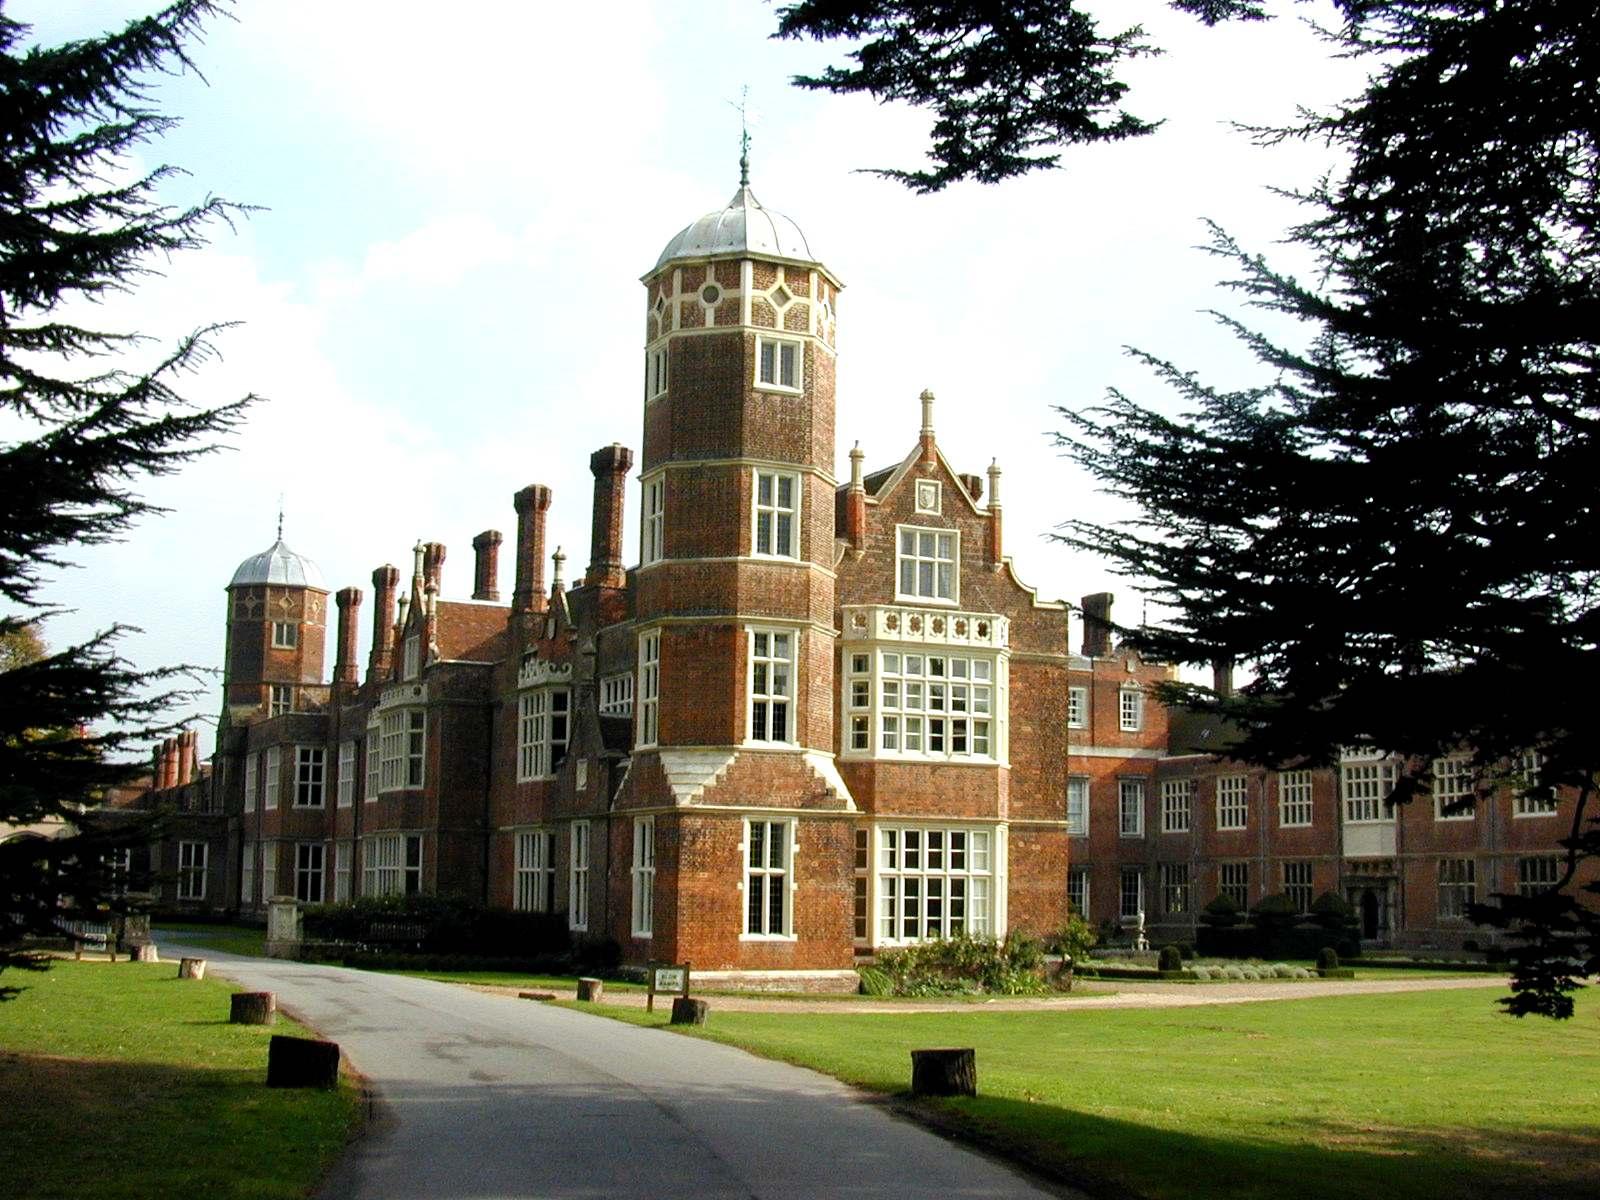 Cobham Hall School